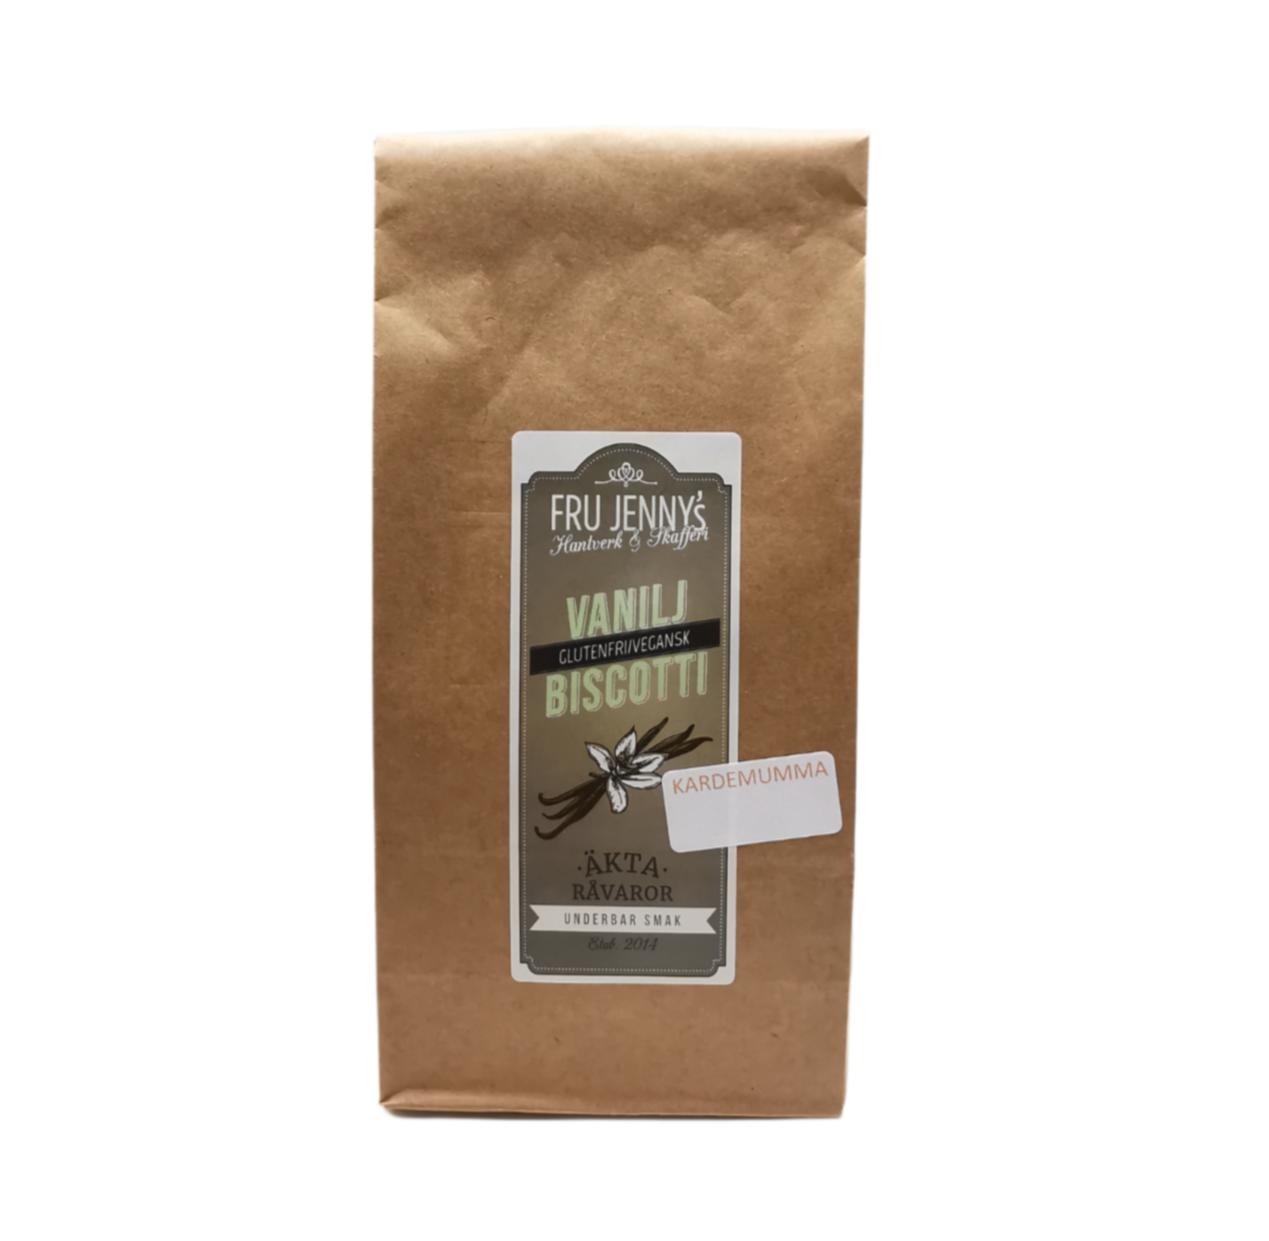 Vanilj Biscotti Glutenfri/Vegan